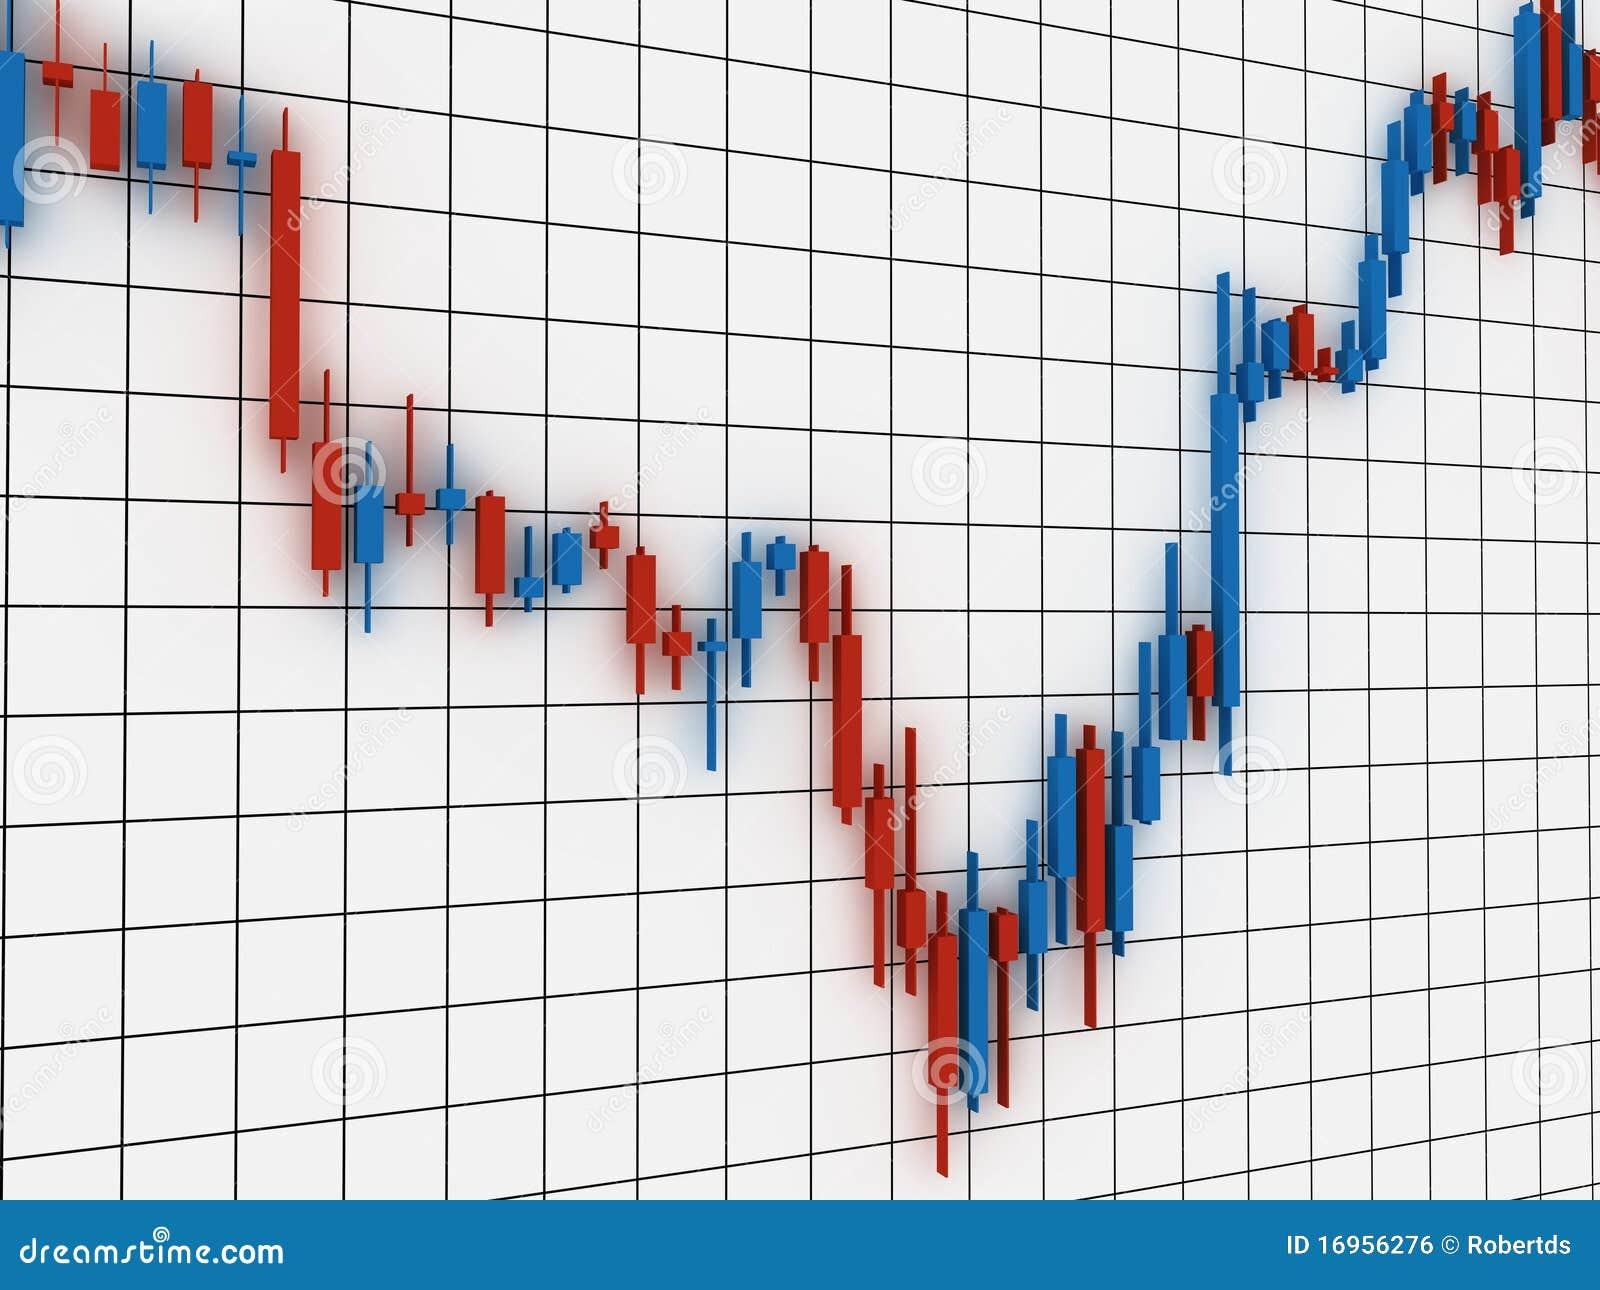 Stock Market Chart Royalty Free Stock Image - Image: 16956276